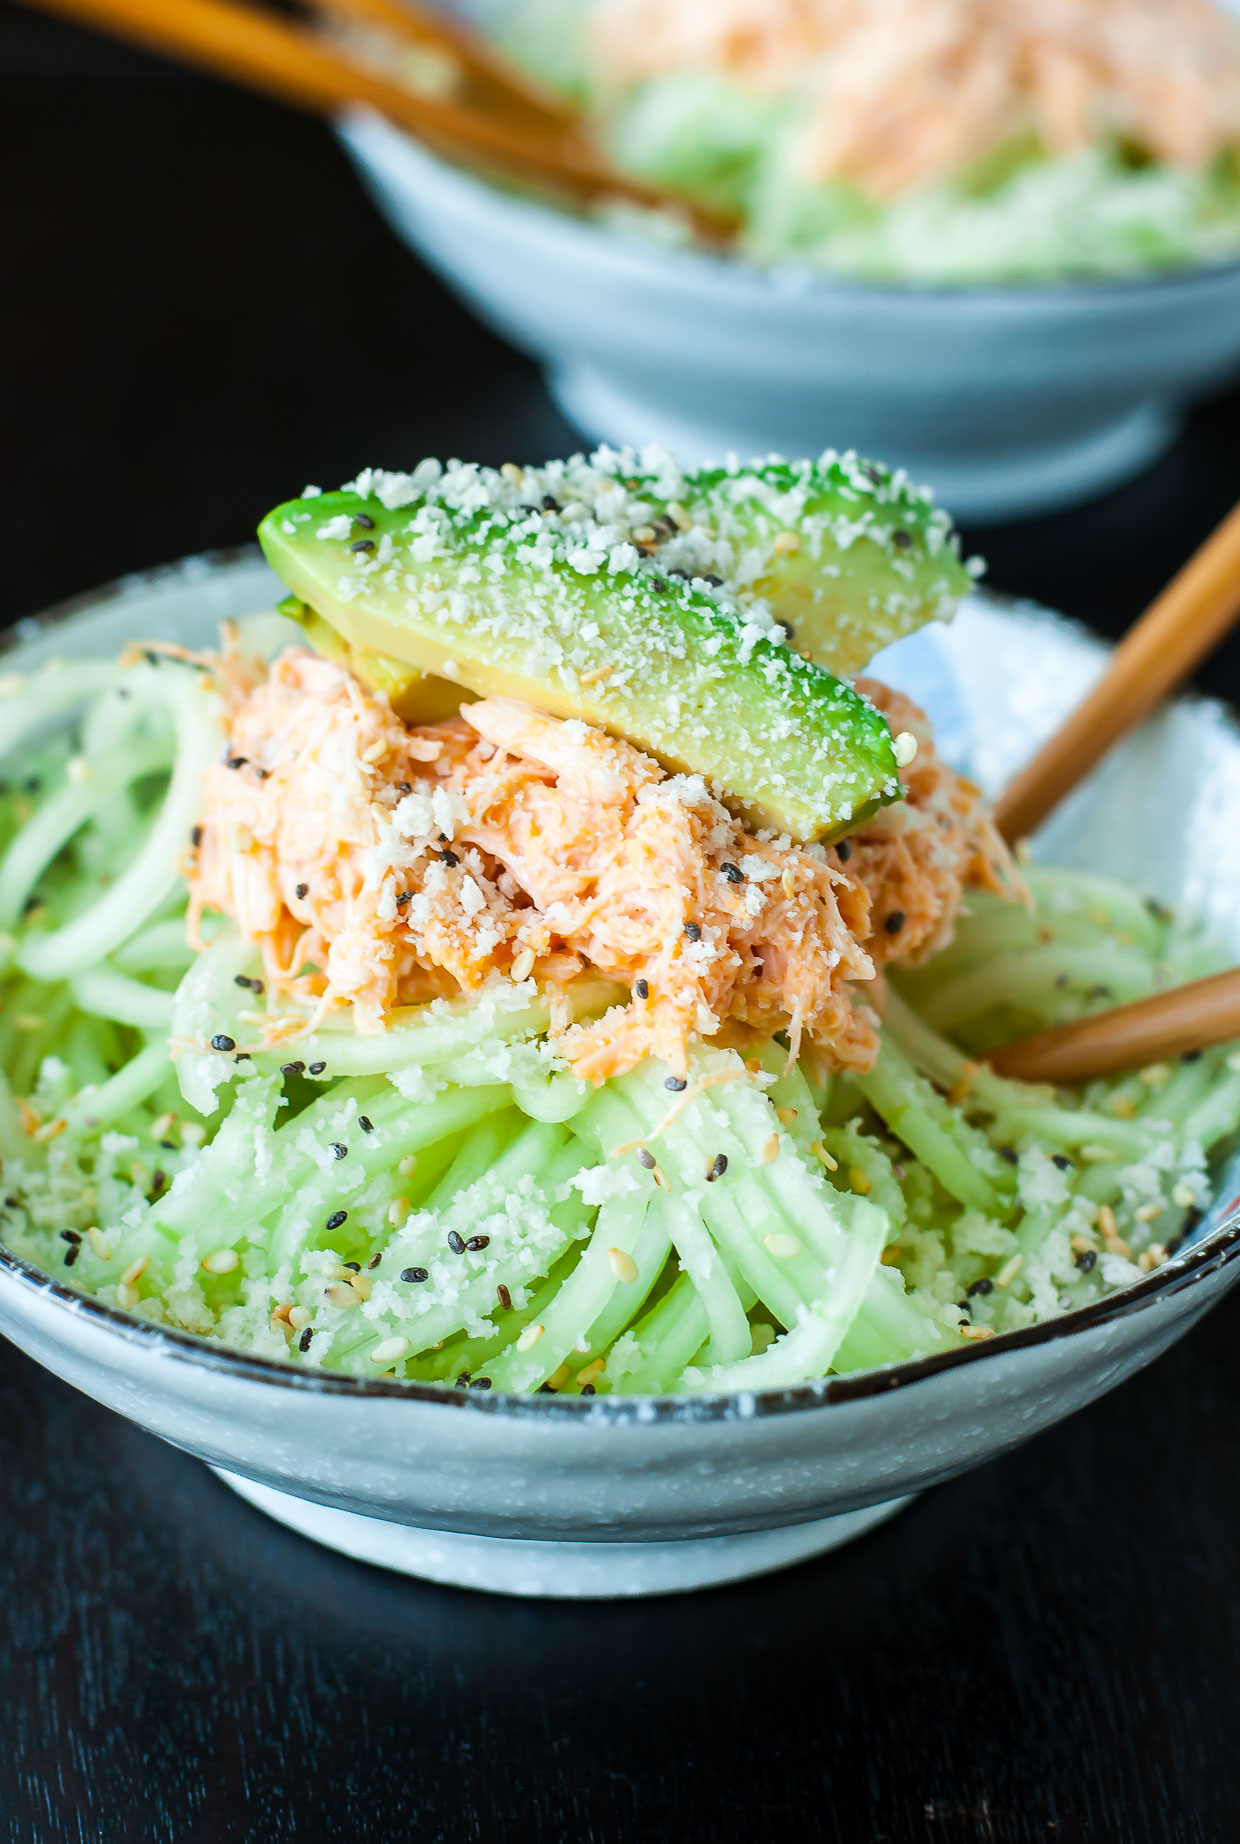 Spicy Sriracha Crab and Cucumber Salad